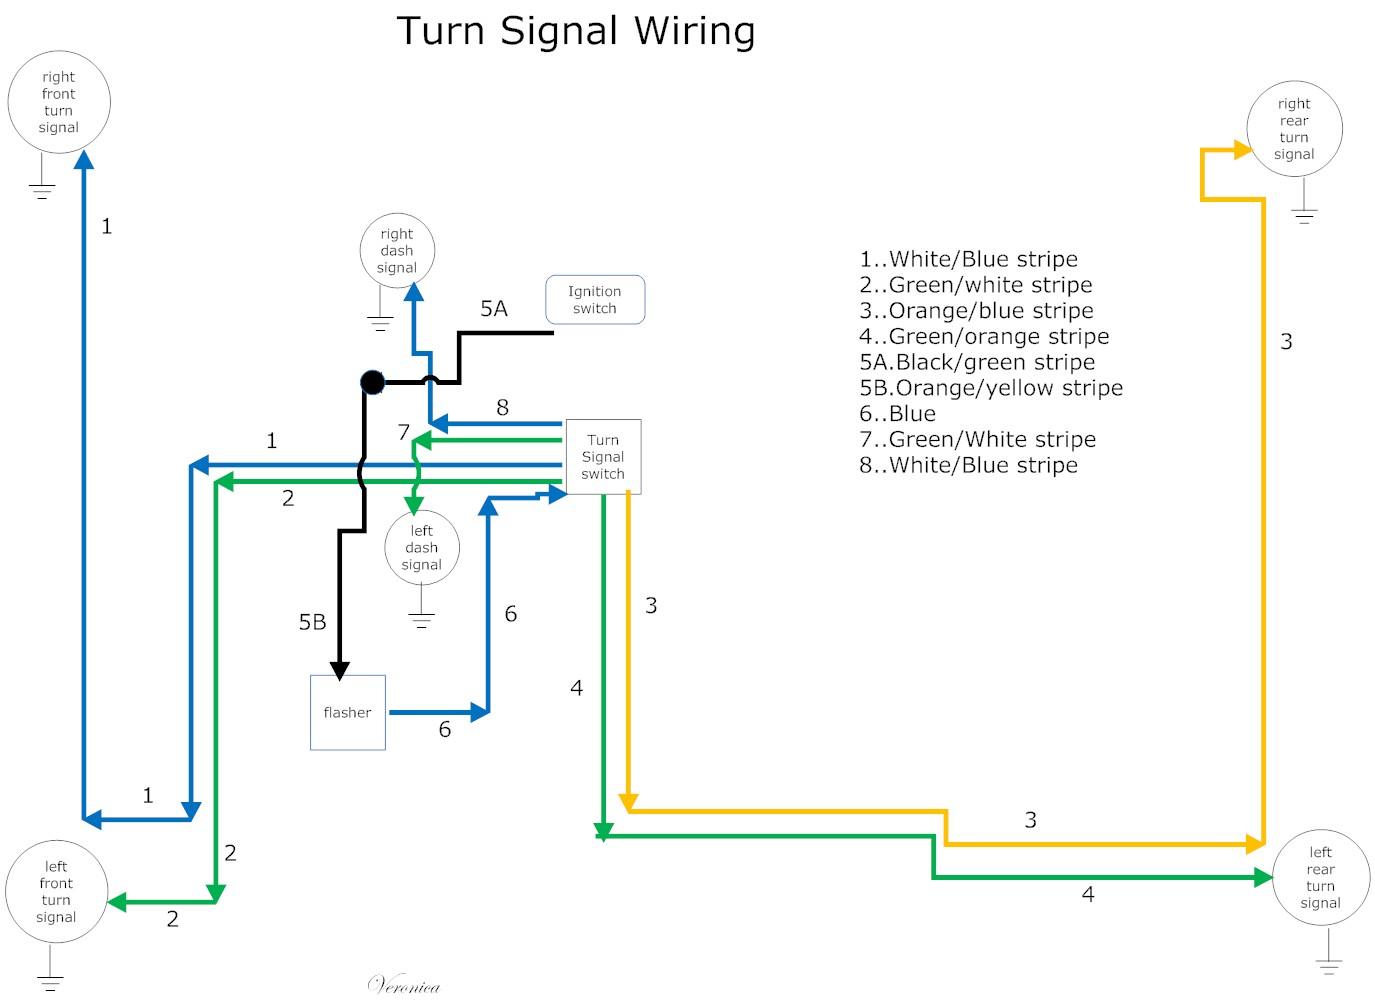 Terrific 1965 Ford F100 Wiring Diagram Basic Electronics Wiring Diagram Wiring Cloud Filiciilluminateatxorg